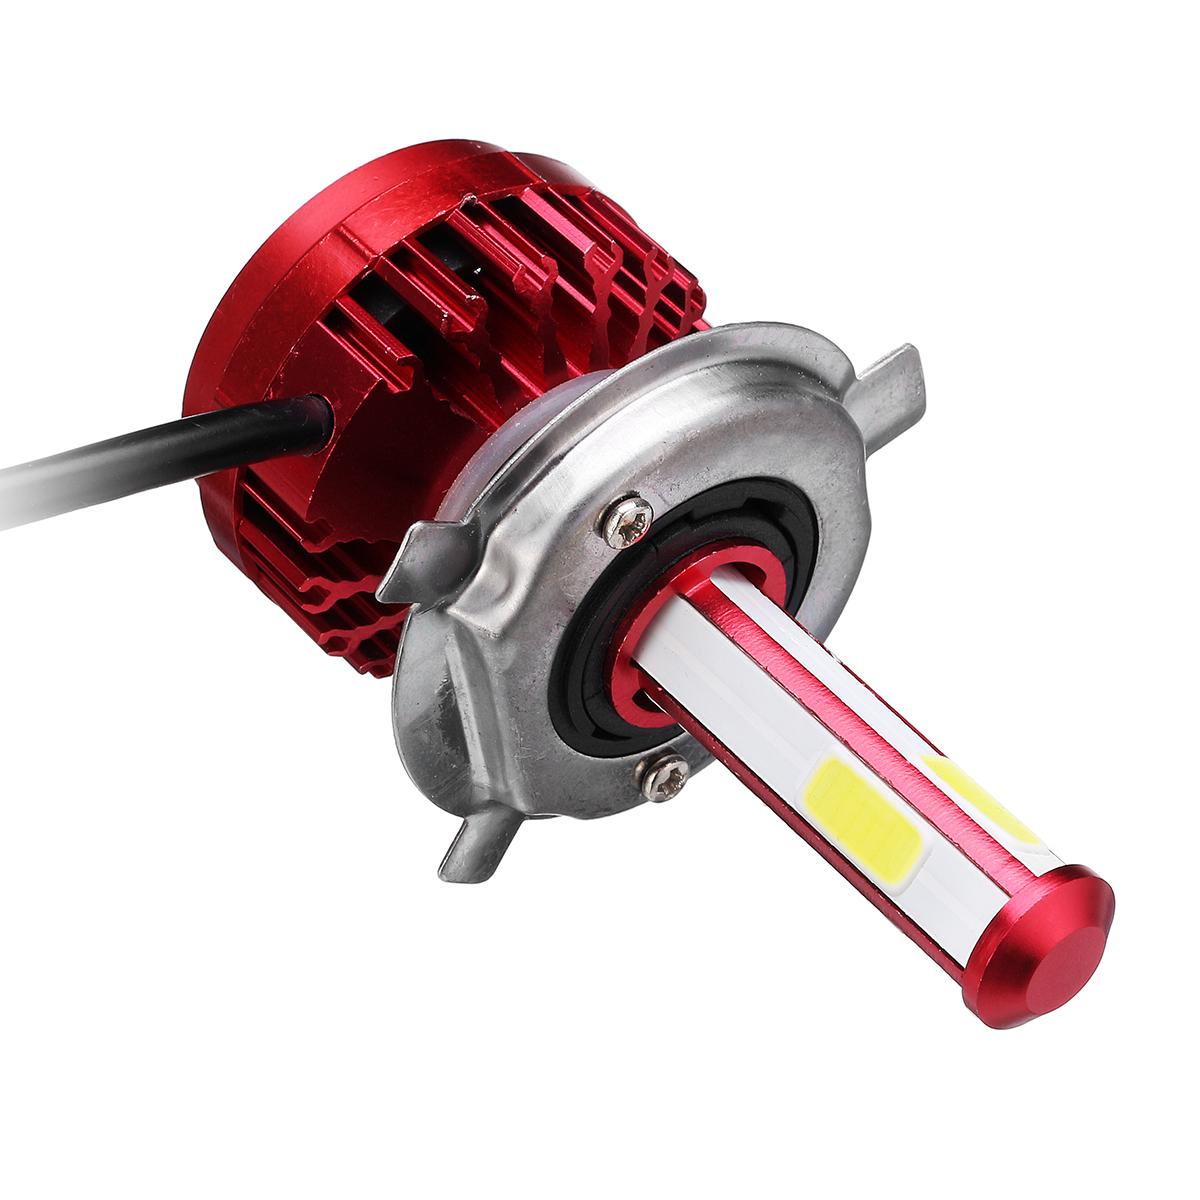 9V-36V 12V 24V H4/H7/9005/9006/H8/H11 LED COB Headlights Conversion Kit 6000K Car Motorcycle Light Bulb